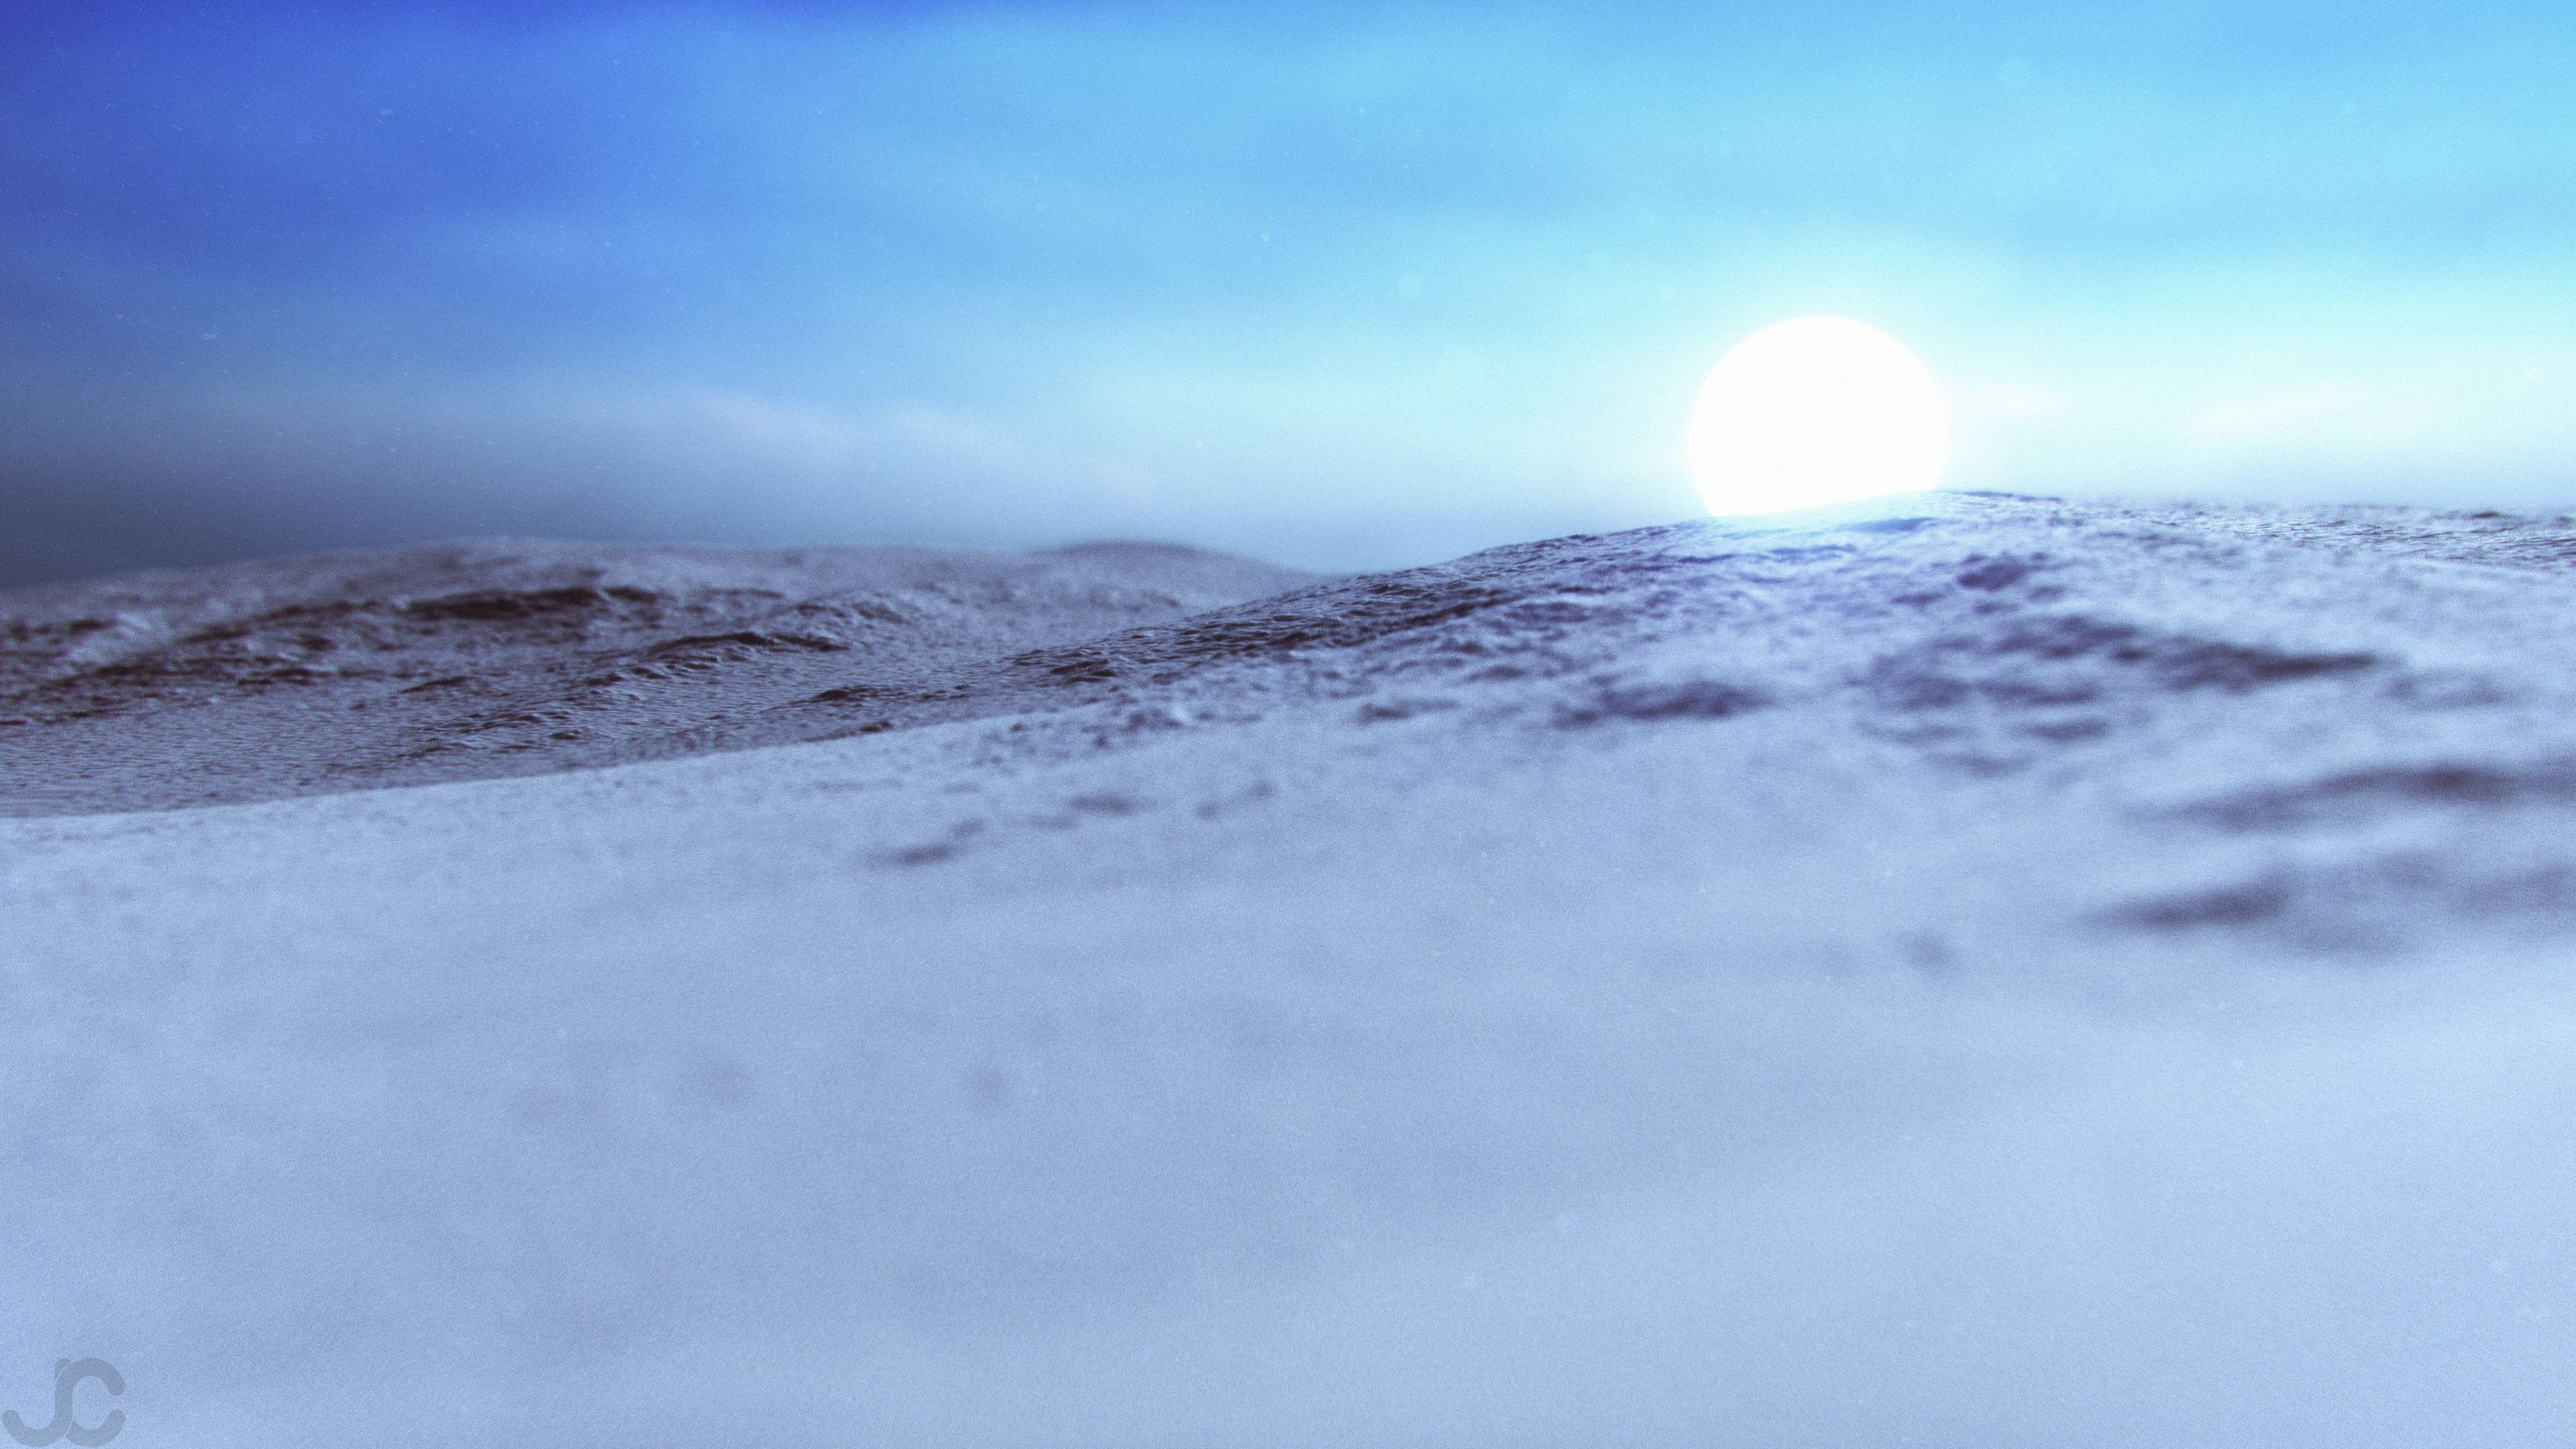 I Made An Astral Dawn Wallpaper In 3d Using Real Mars Terrain Data 3840x2160OC Ifttt 2nLASkH